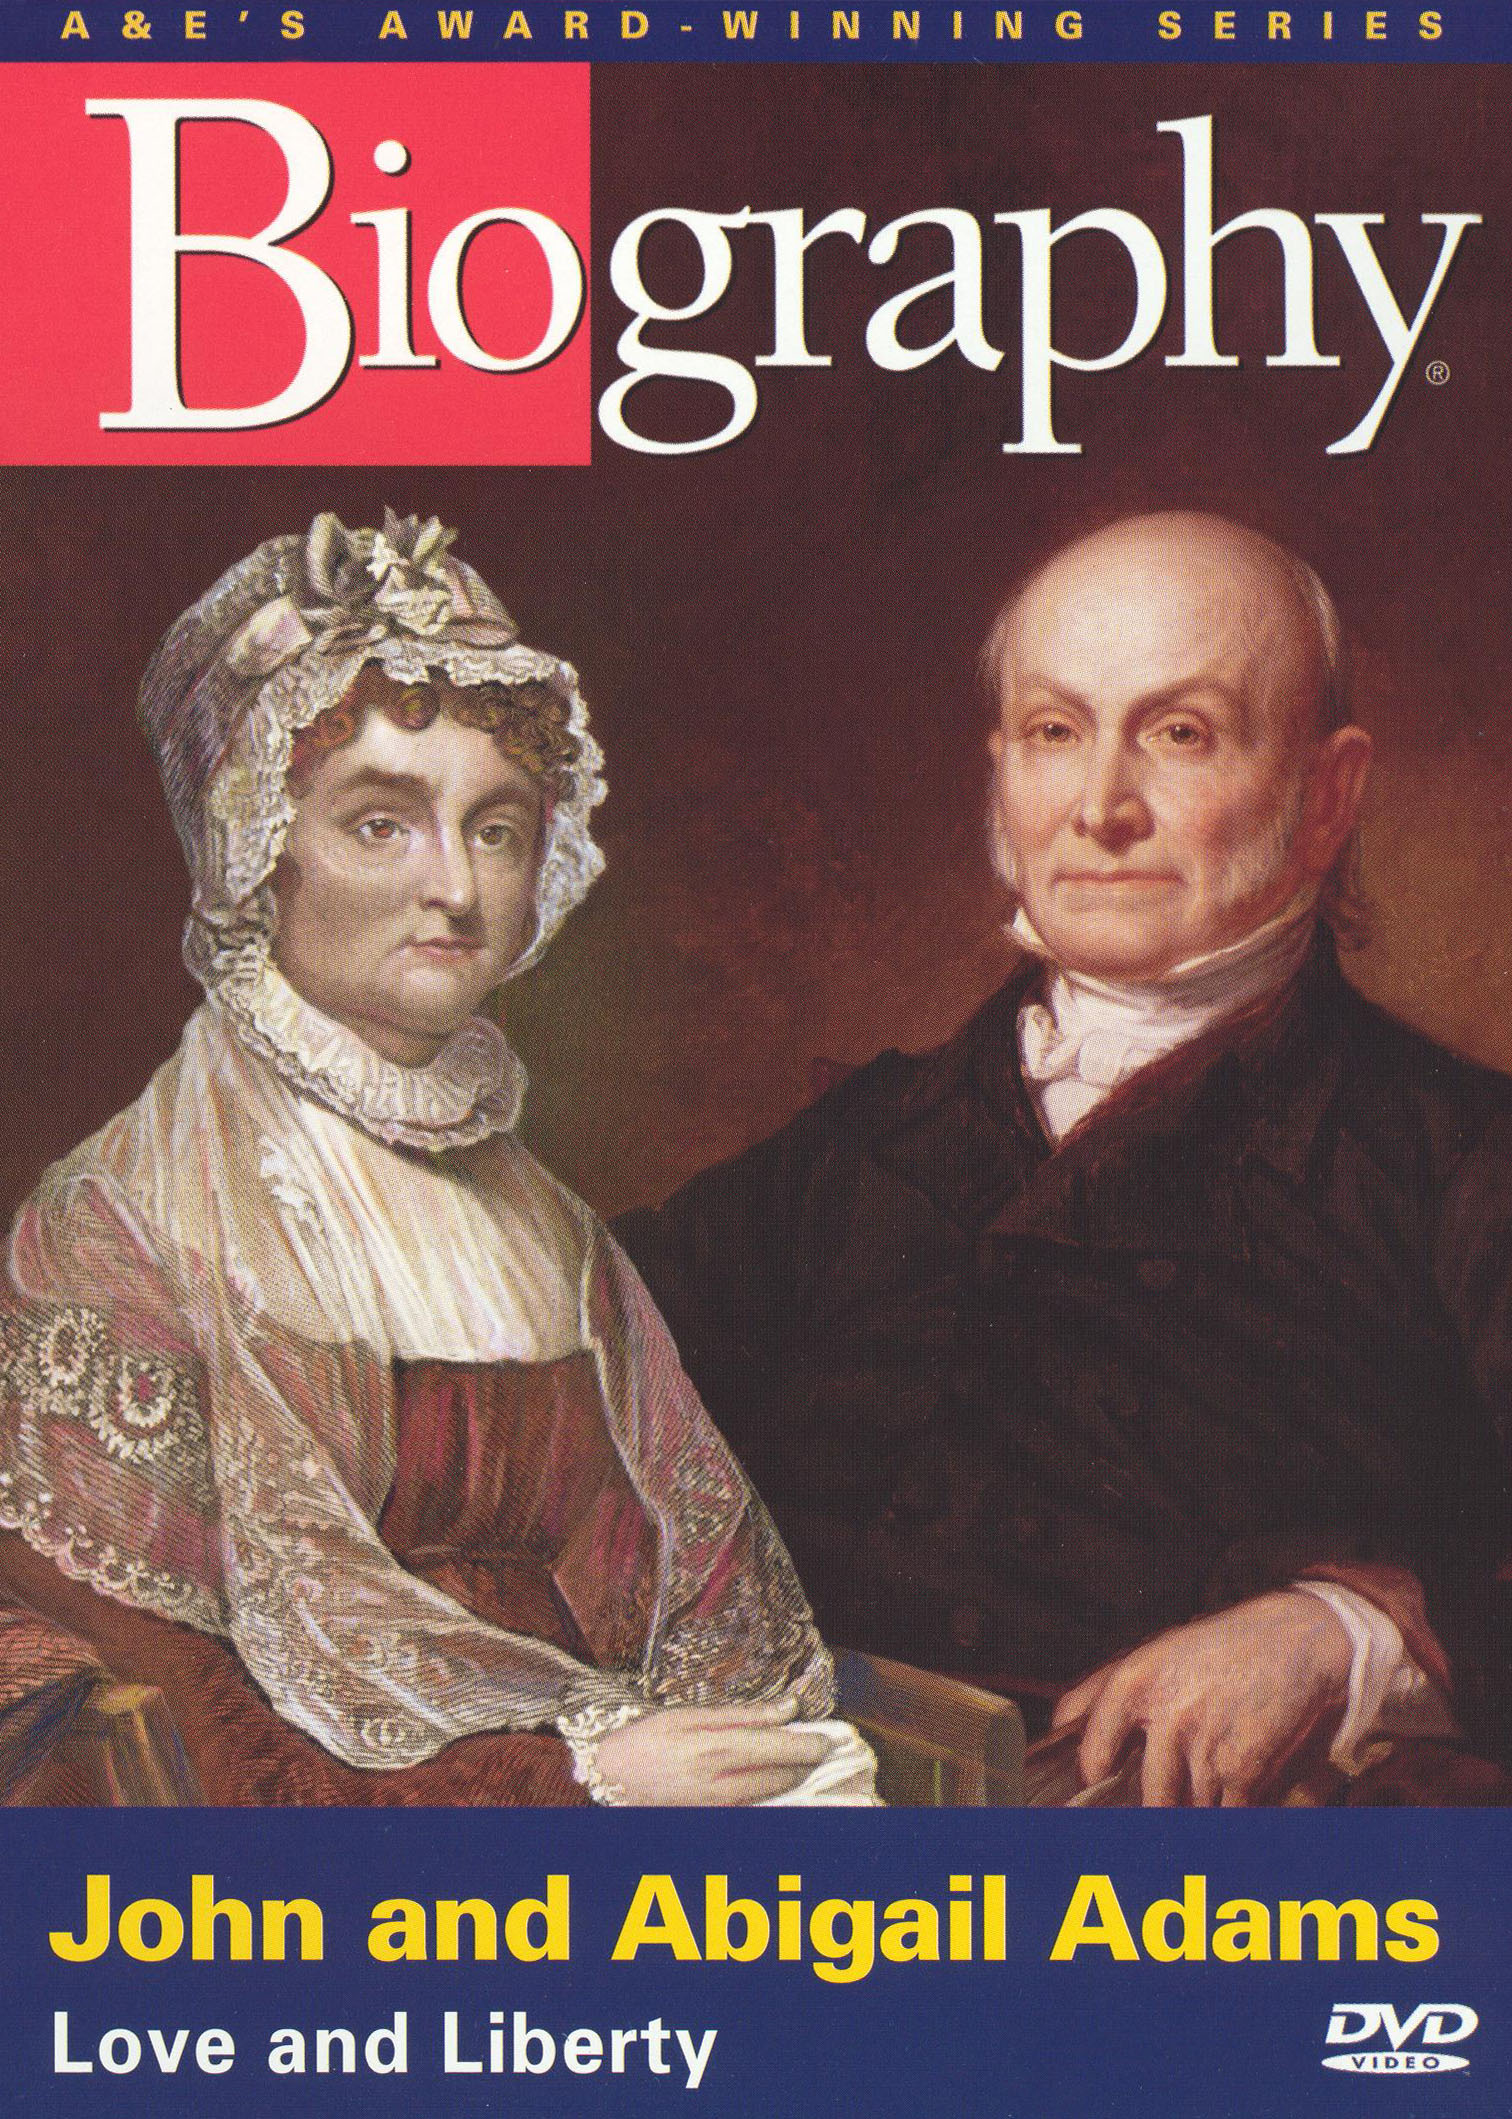 Biography: John and Abigail Adams